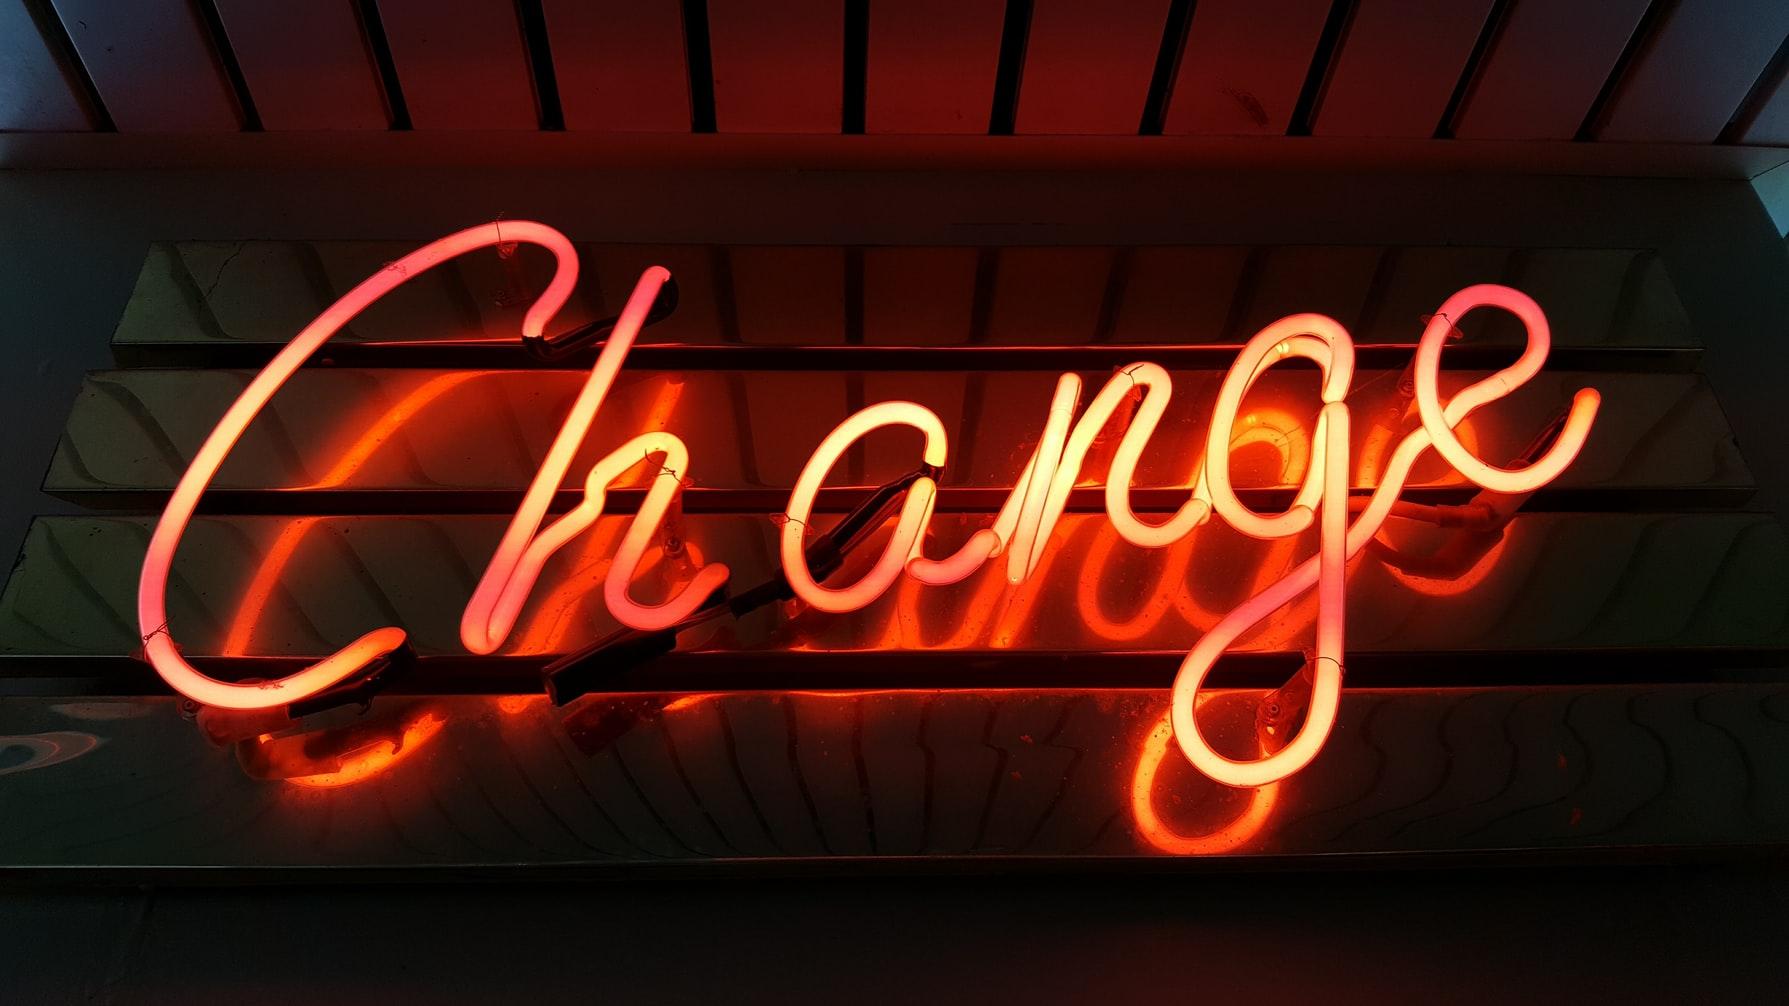 investormindset-adapatingtochange-investmentopportunities